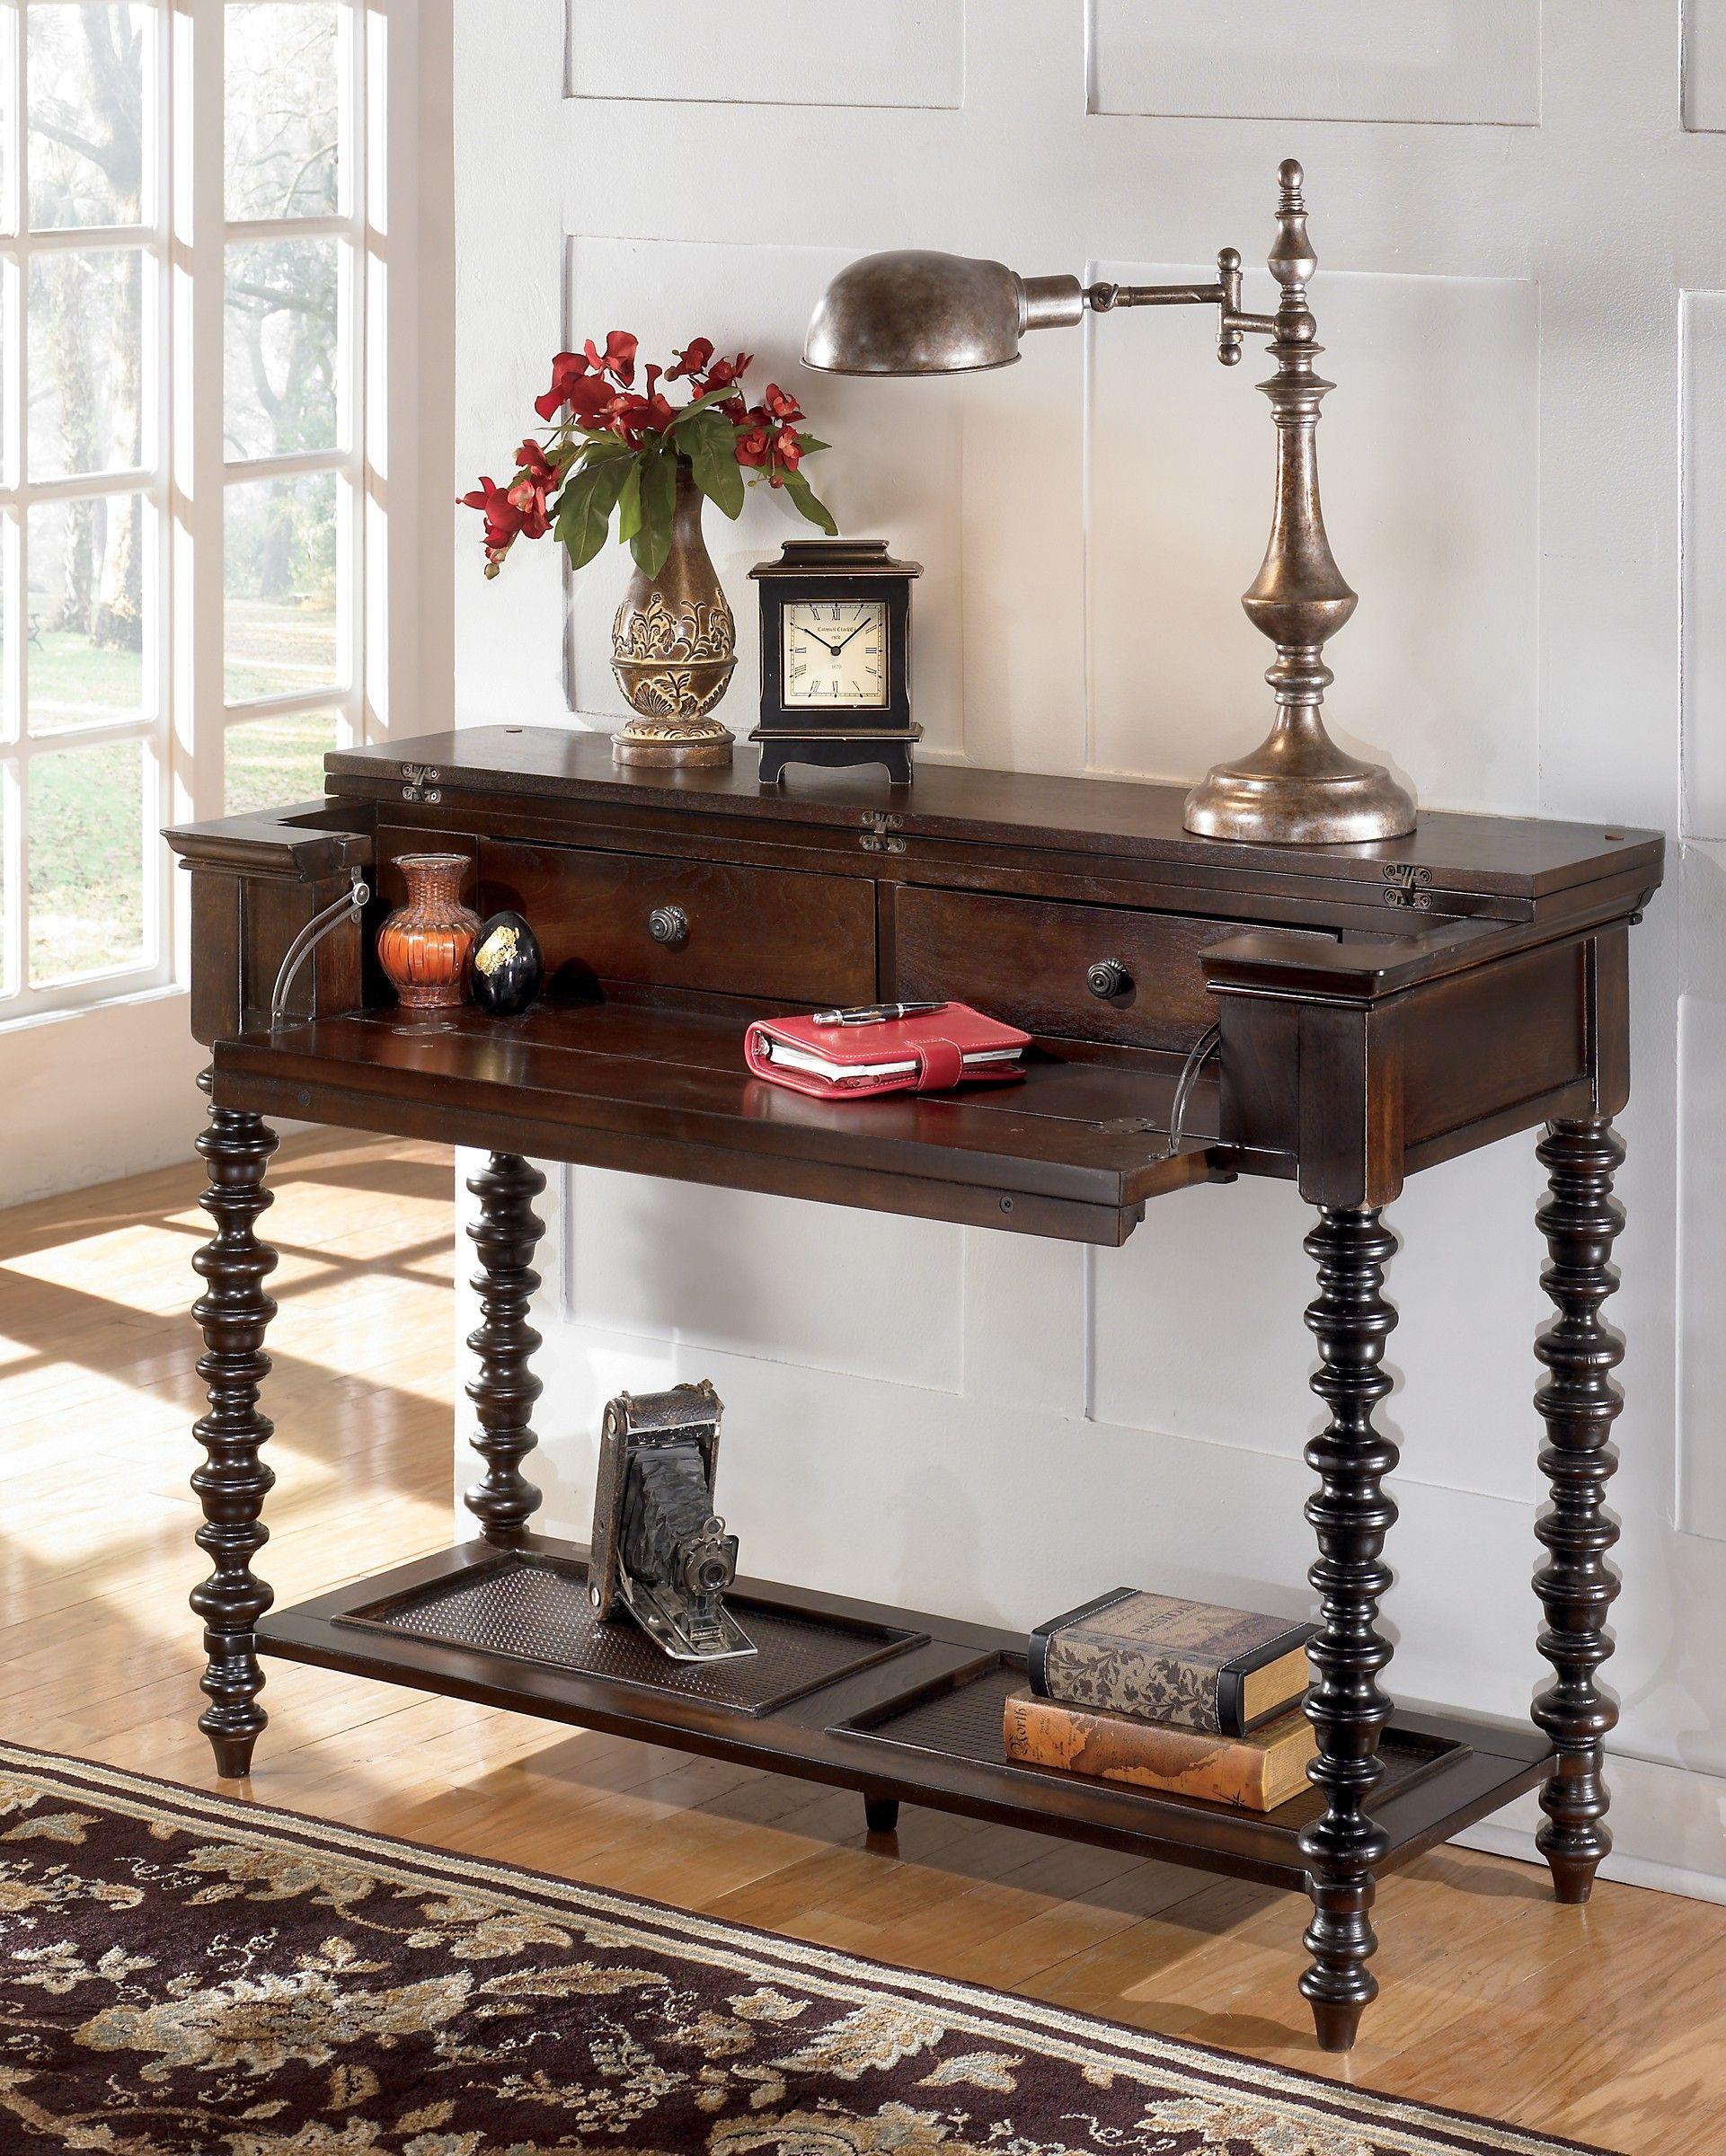 Astonishing Ashley Key Town T668 4 Signature Design Sofa Table The Download Free Architecture Designs Sospemadebymaigaardcom